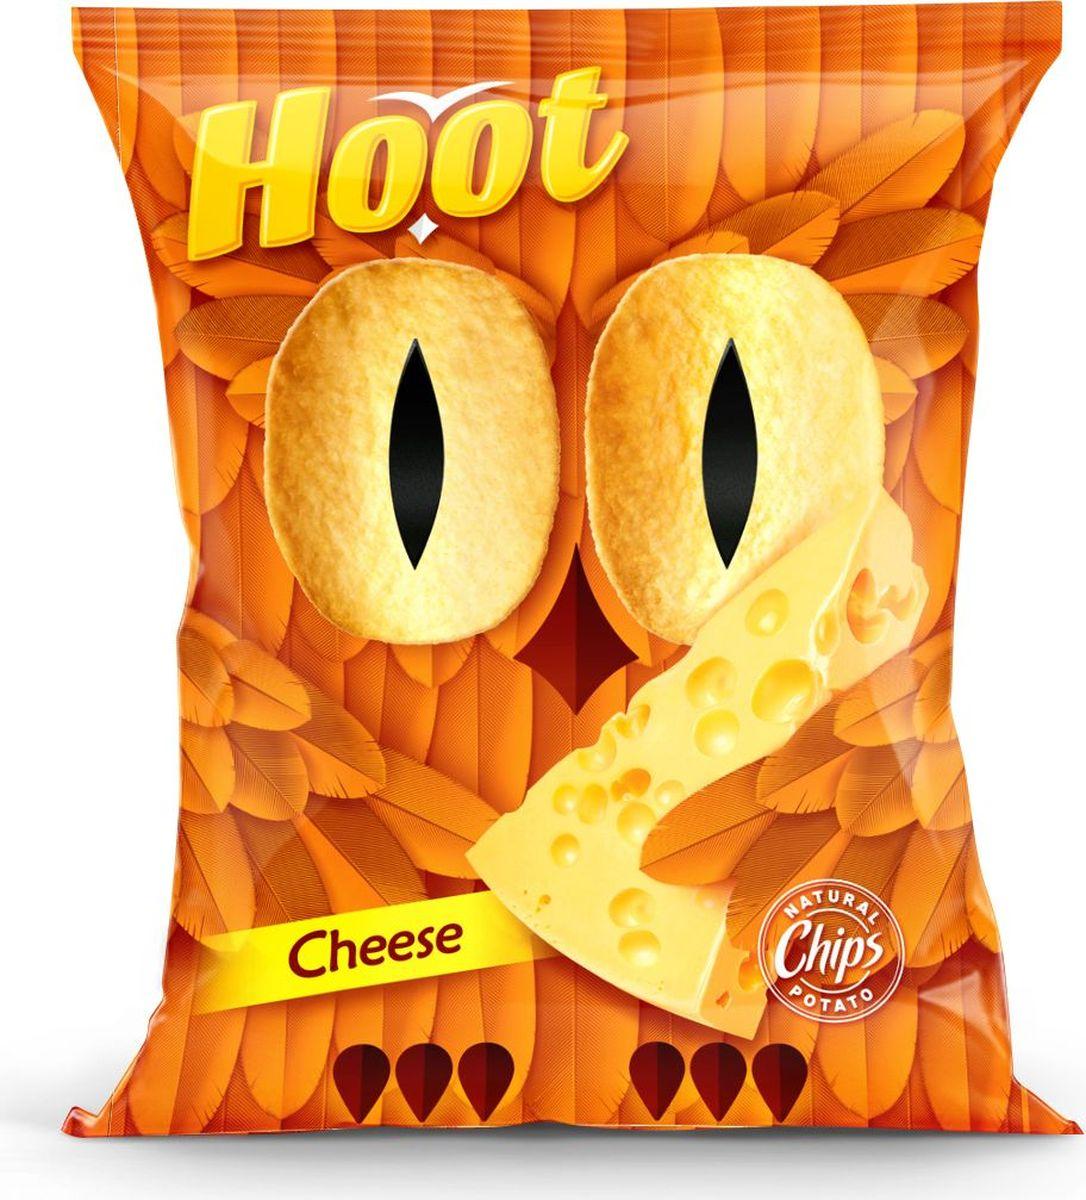 Hoot Чипсы, сыр, 70 г